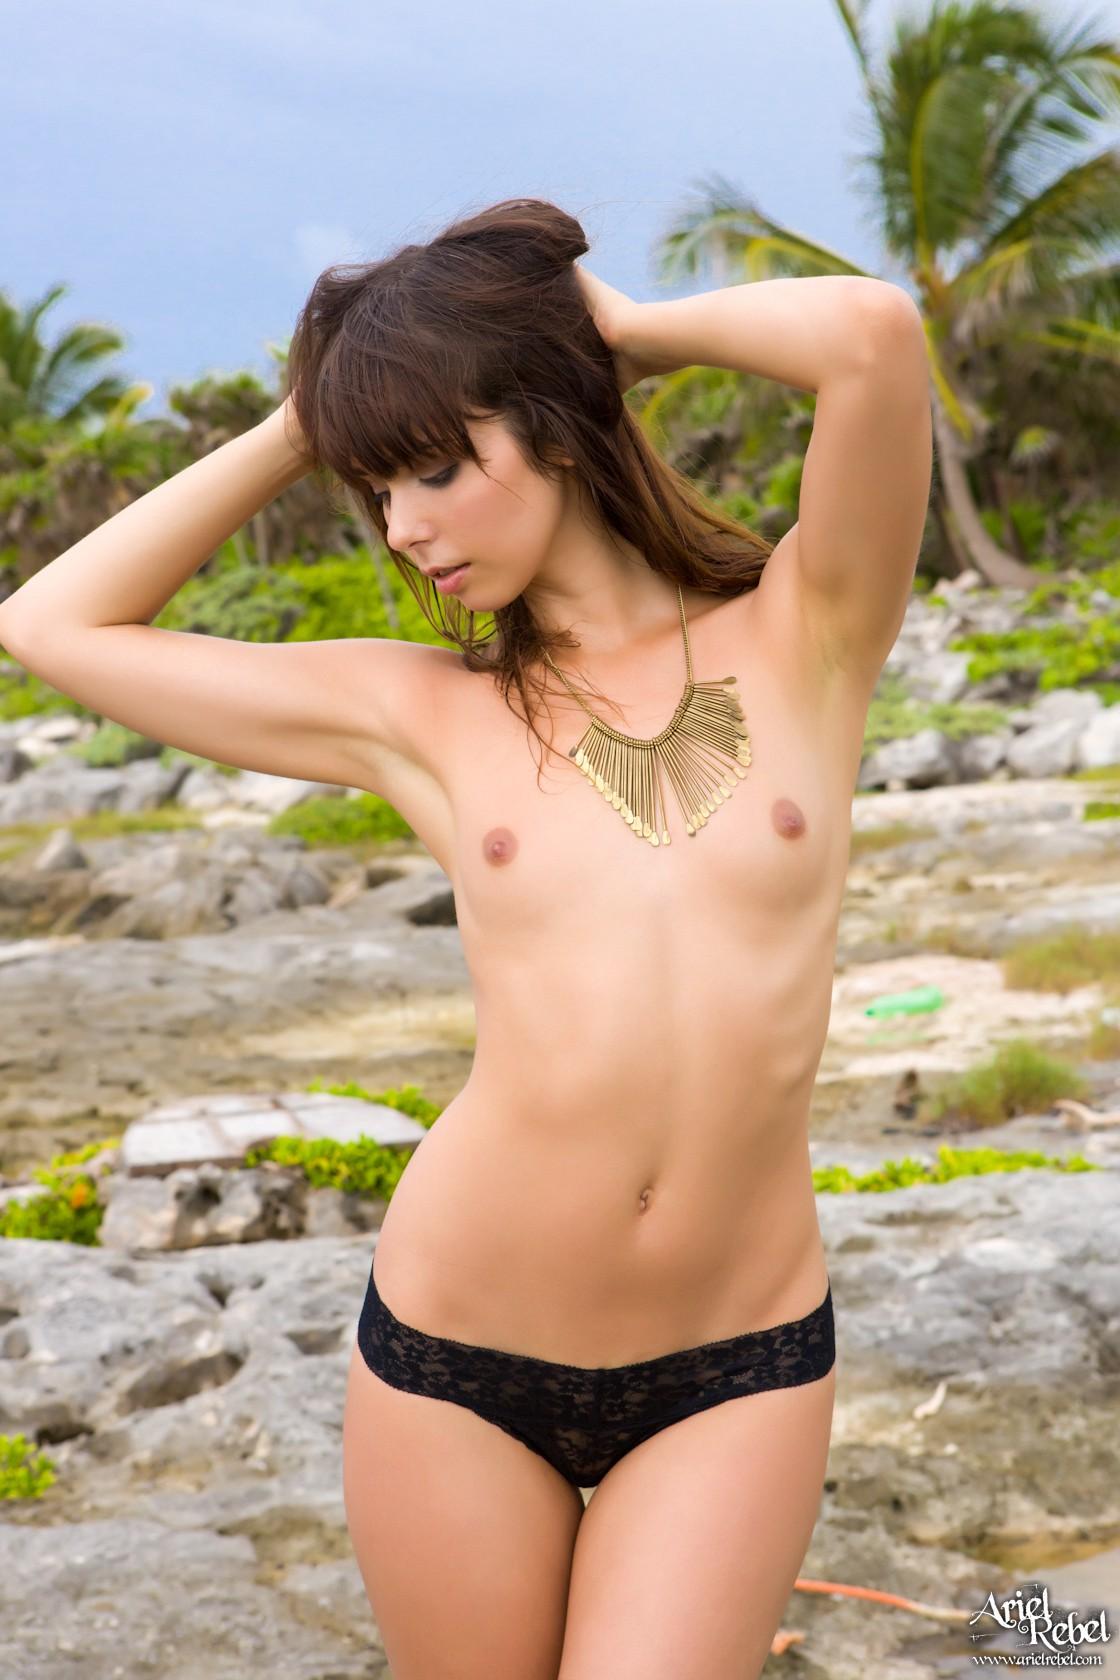 Caribbean_Beauty_006-lg